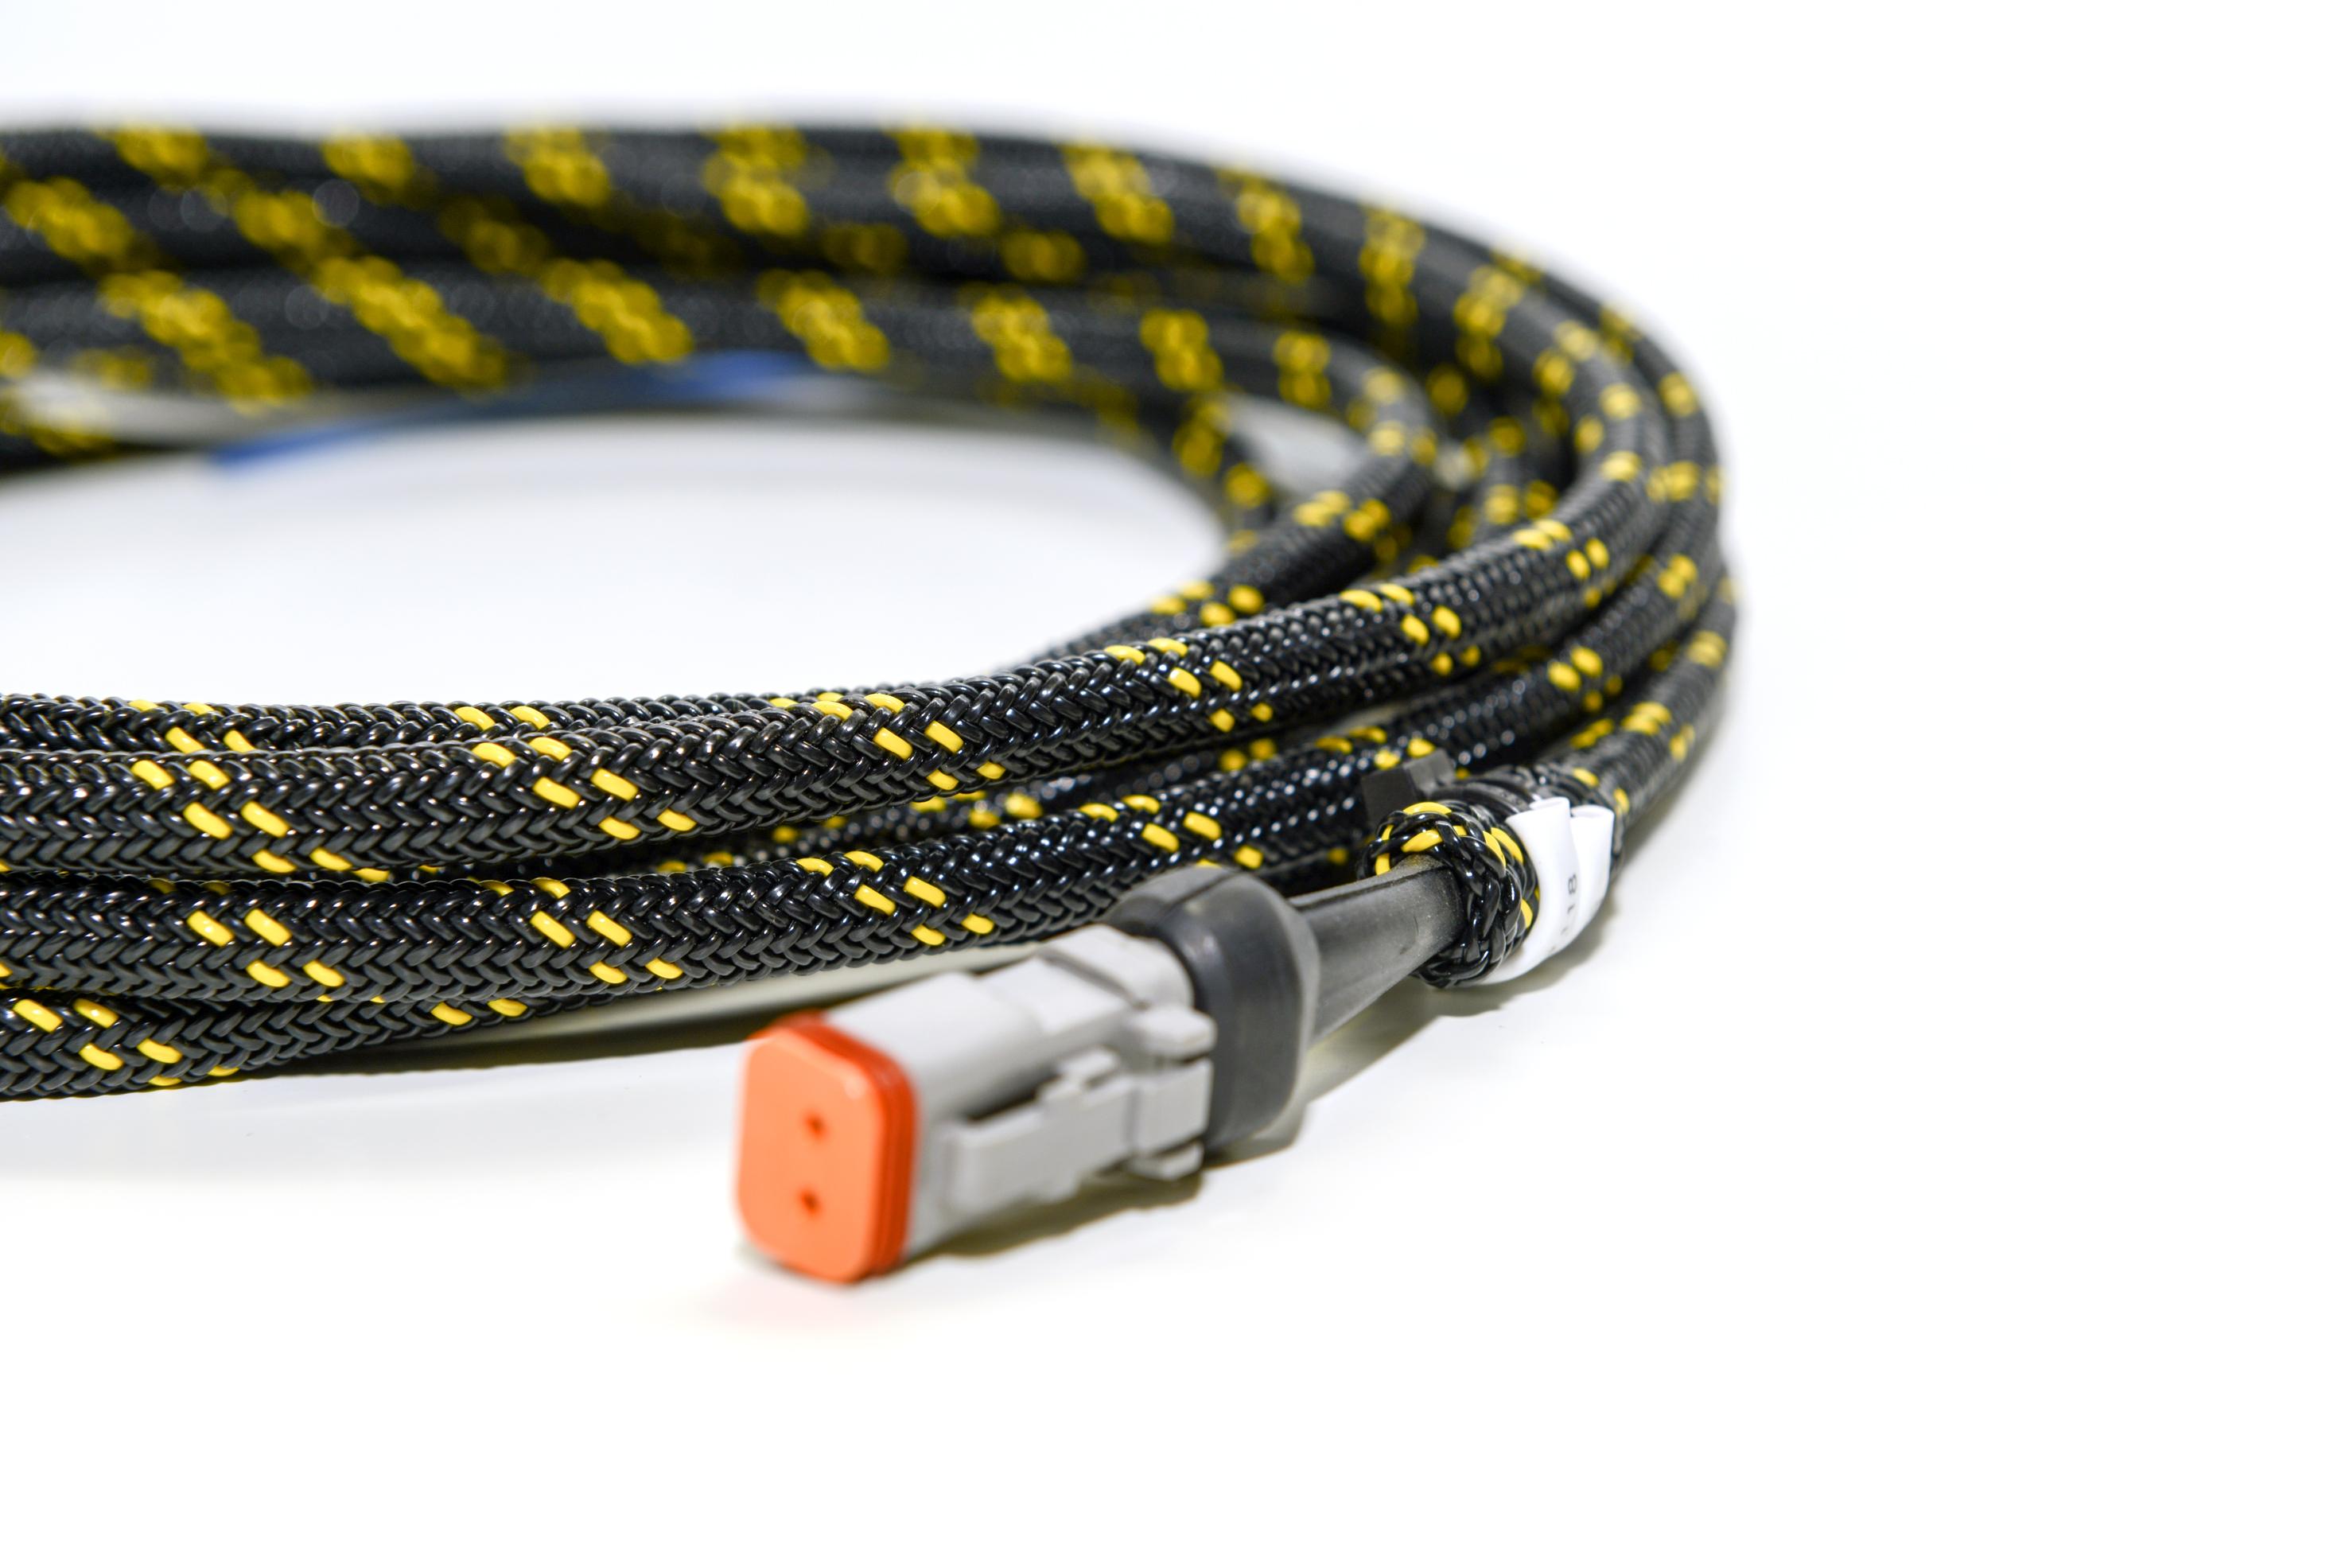 Wiring Harness Manufacturers Australia : Wiring harness allplant auto electrics